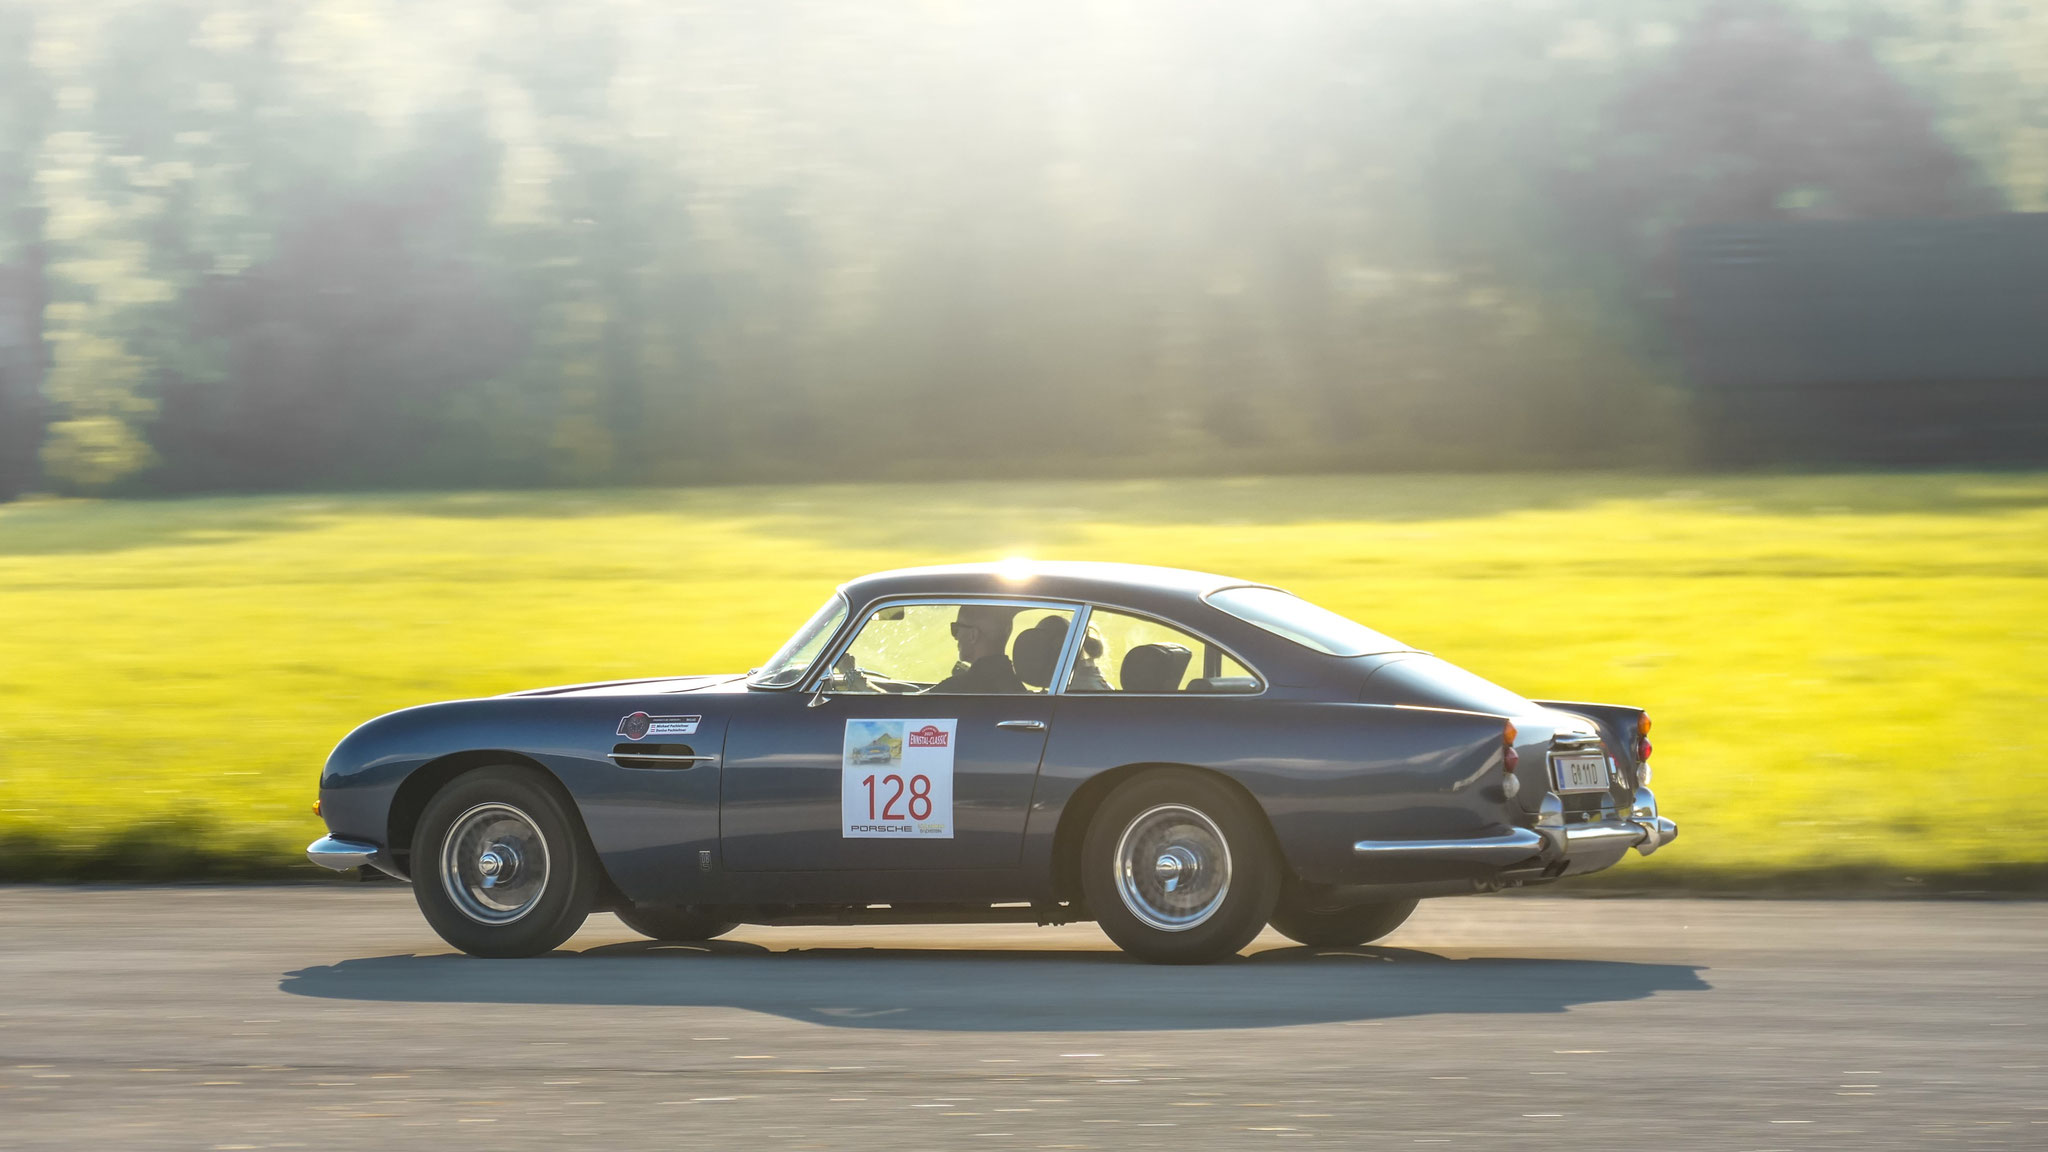 Aston Martin DB5 - G-11-D (AUT)